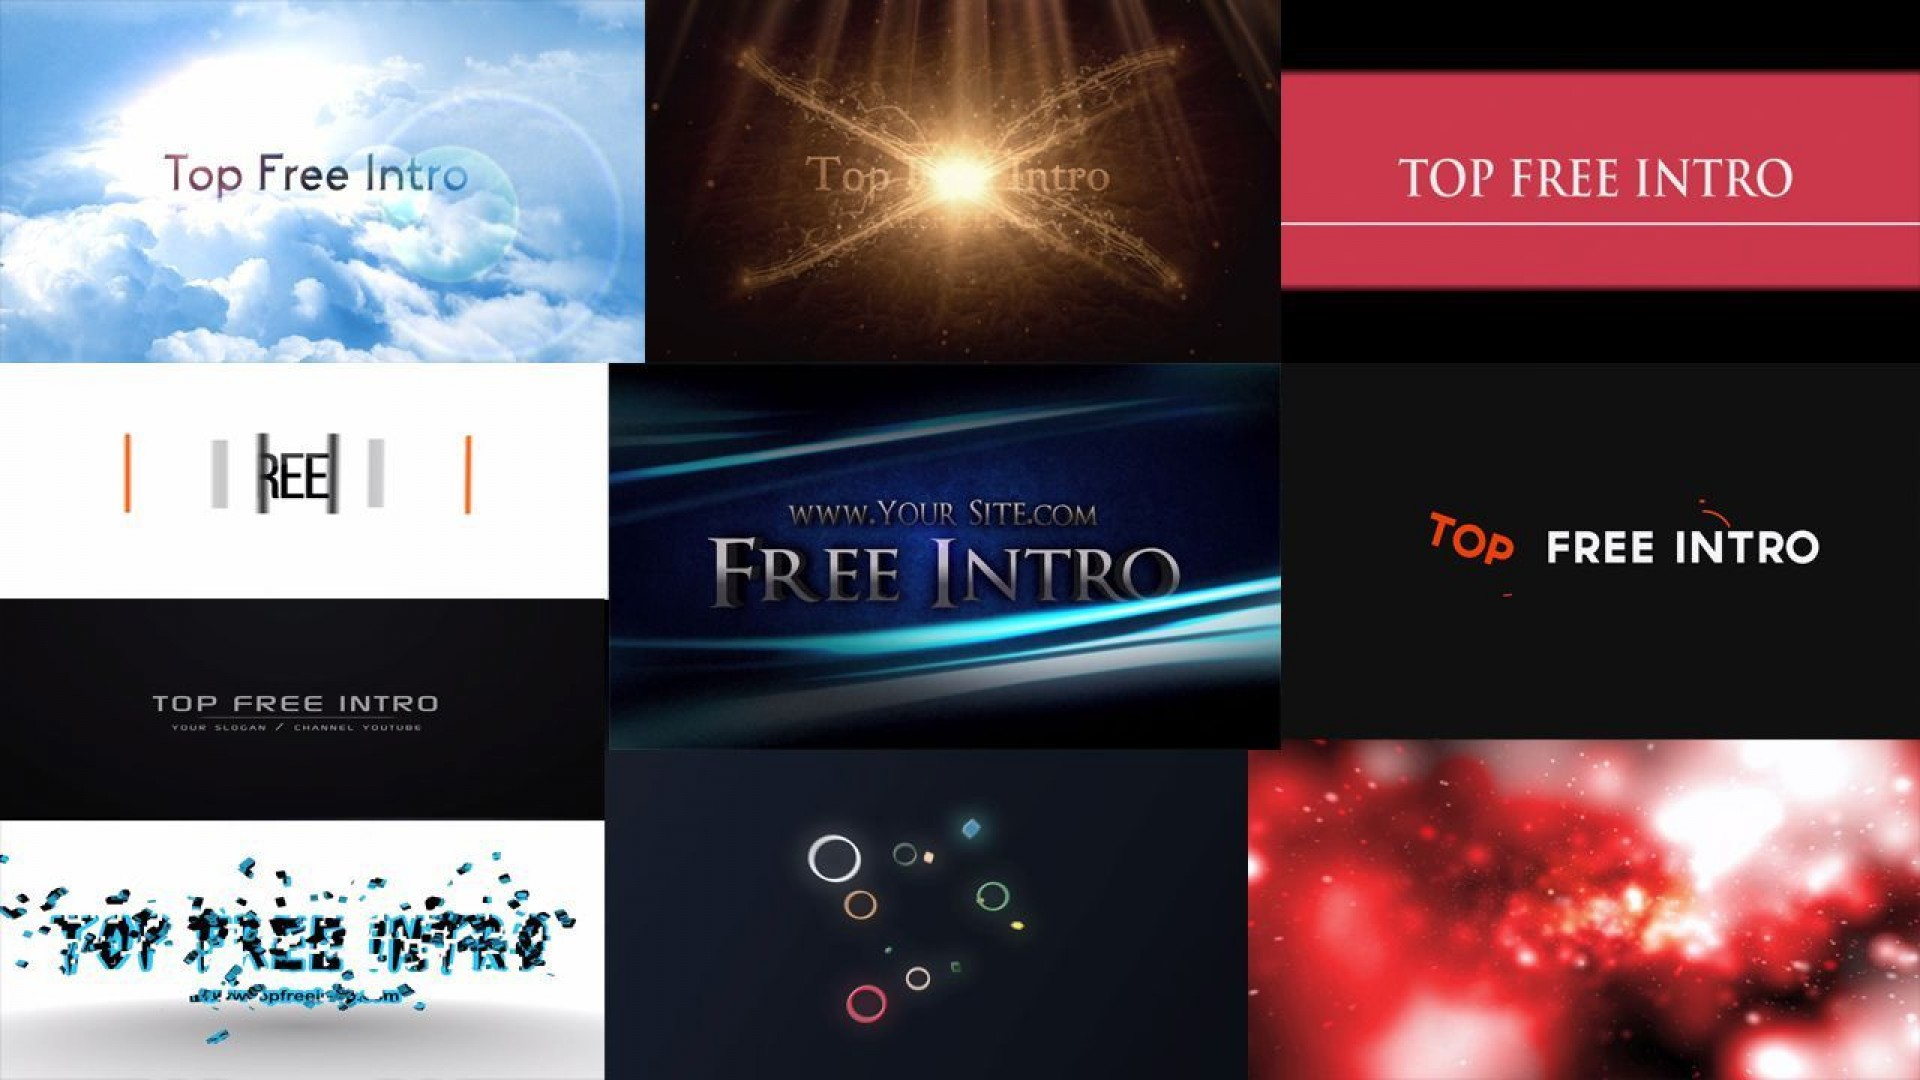 009 Sensational Free Adobe After Effect Logo Intro Template Idea  Templates1920